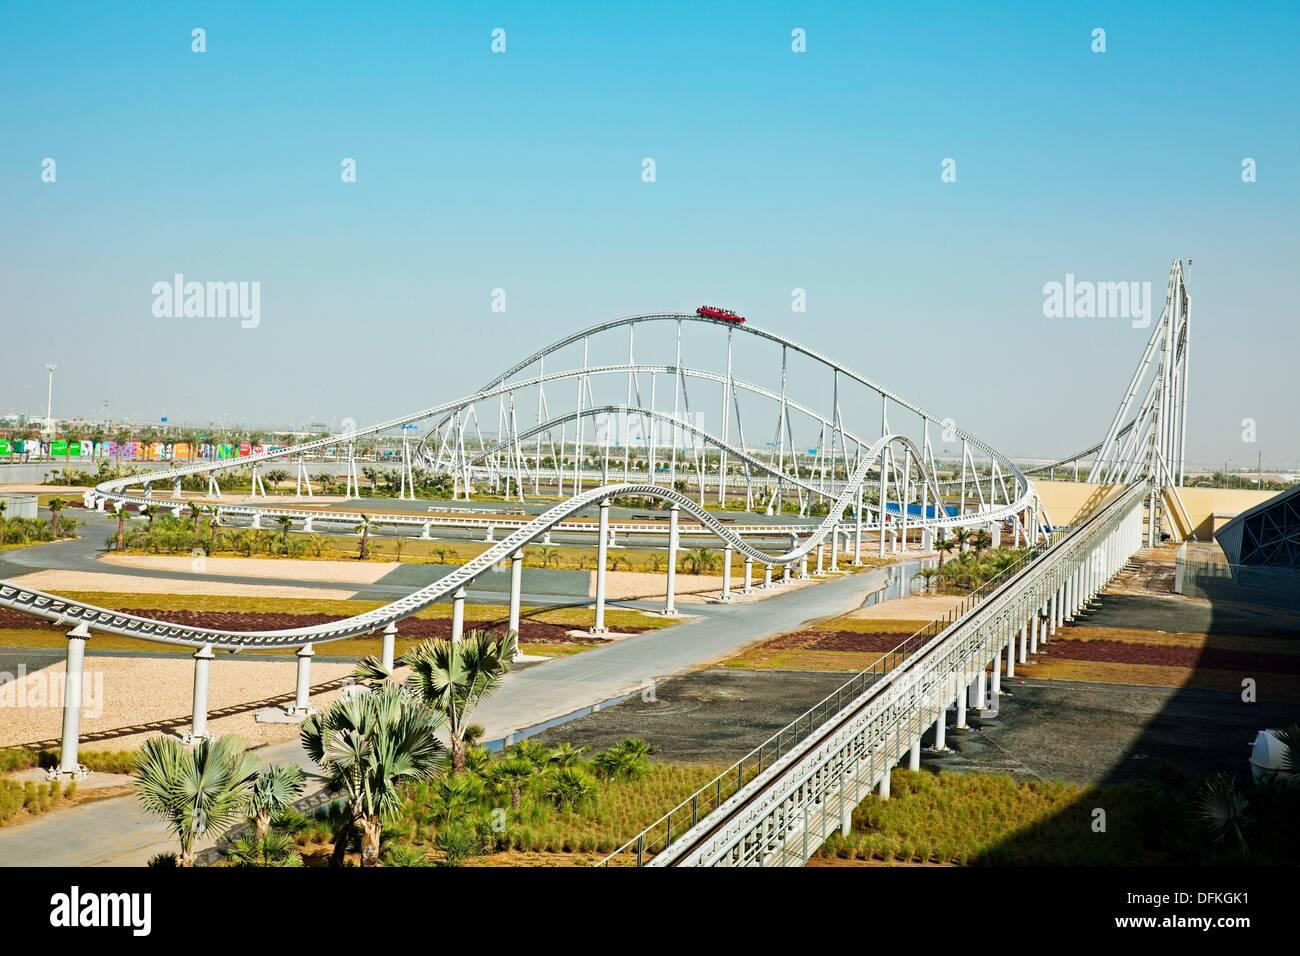 Roller Coaster Ferrari World Abu Dhabi Galleria Di